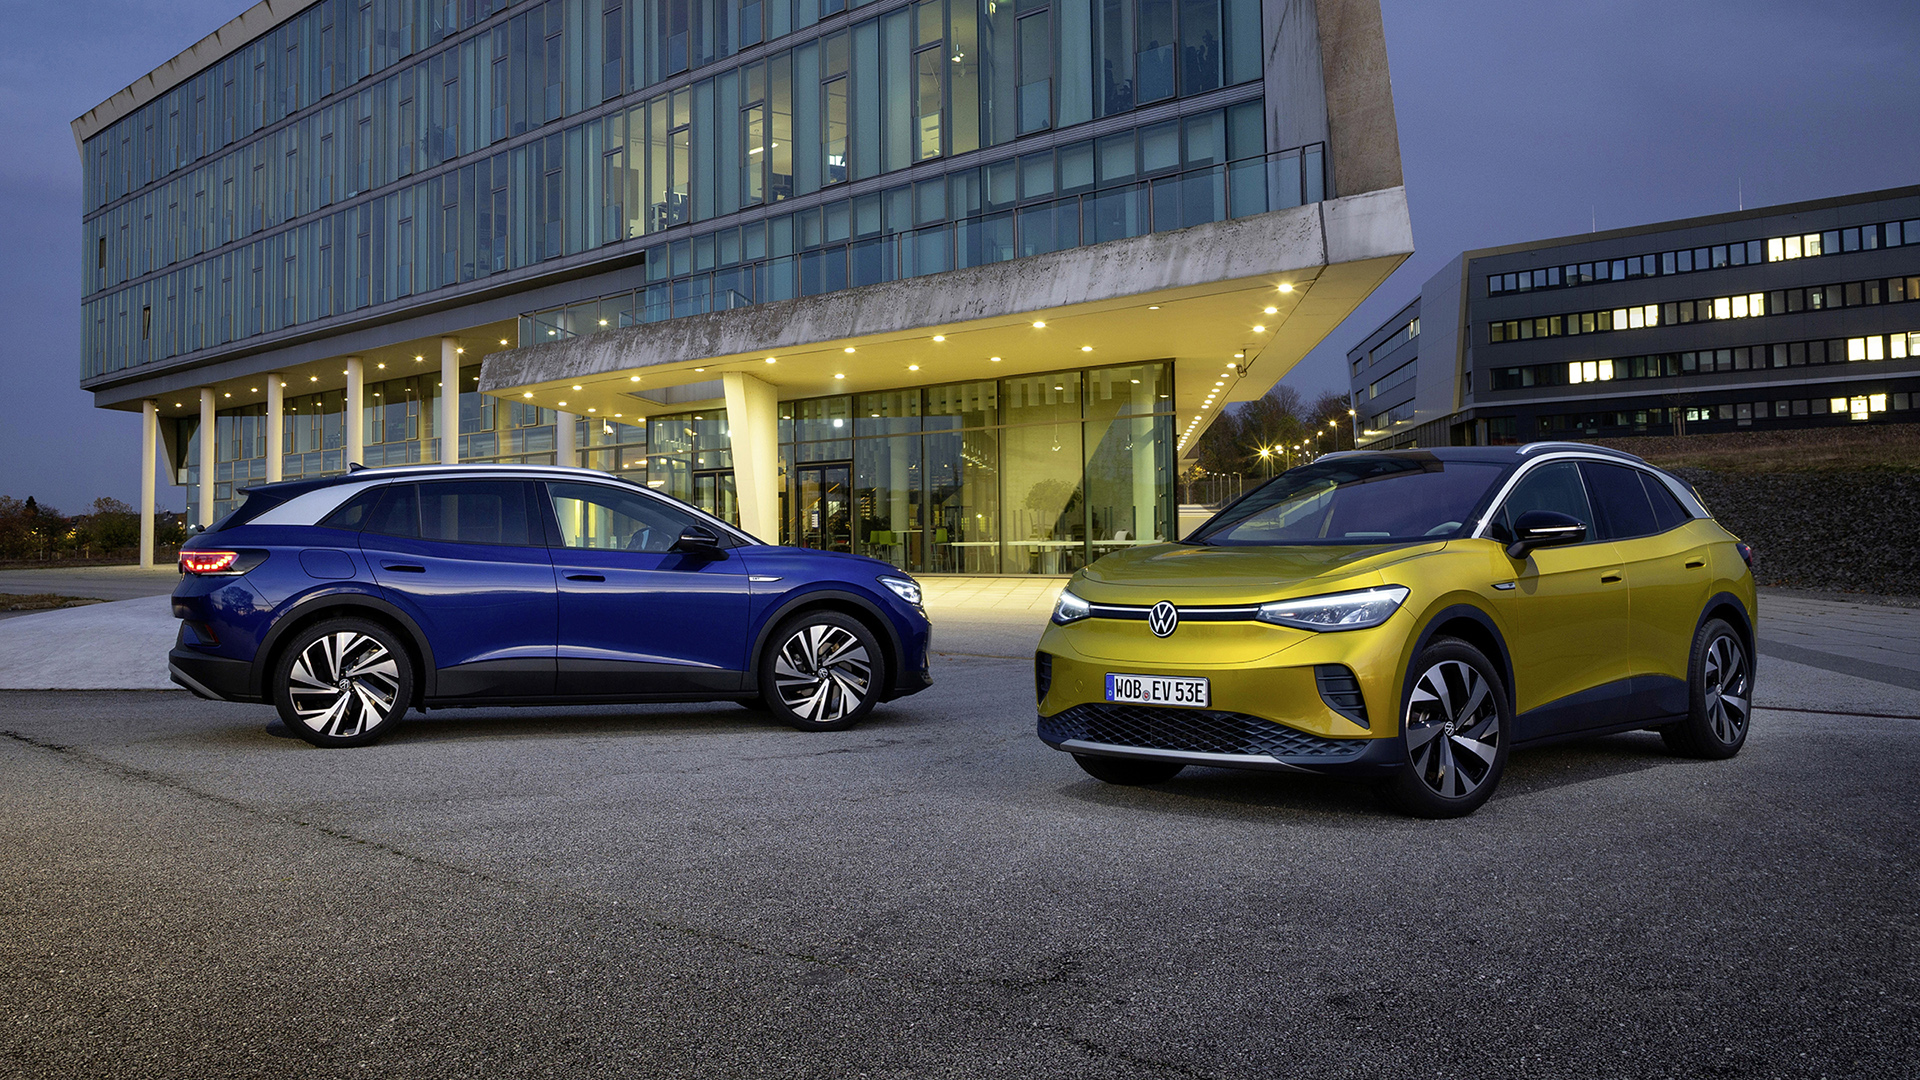 "ID.4 1 Η Volkswagen μας αφήνει να ρίξουμε μια ""ματιά"" στο μέλλον της αυτοκίνησης Electric cars, electric vehicles, ID.3, ID.4, ID.4 GTX, Volkswagen, Volkswagen Group, Volkswagen ID.3, Volkswagen ID.4, Volkswagen ID.4 GTX, VW, VW ID.3, zblog, ειδήσεις, ηλεκτρικά, ηλεκτροκινηση, κινουμαι ηλεκτρικα, Νέα"